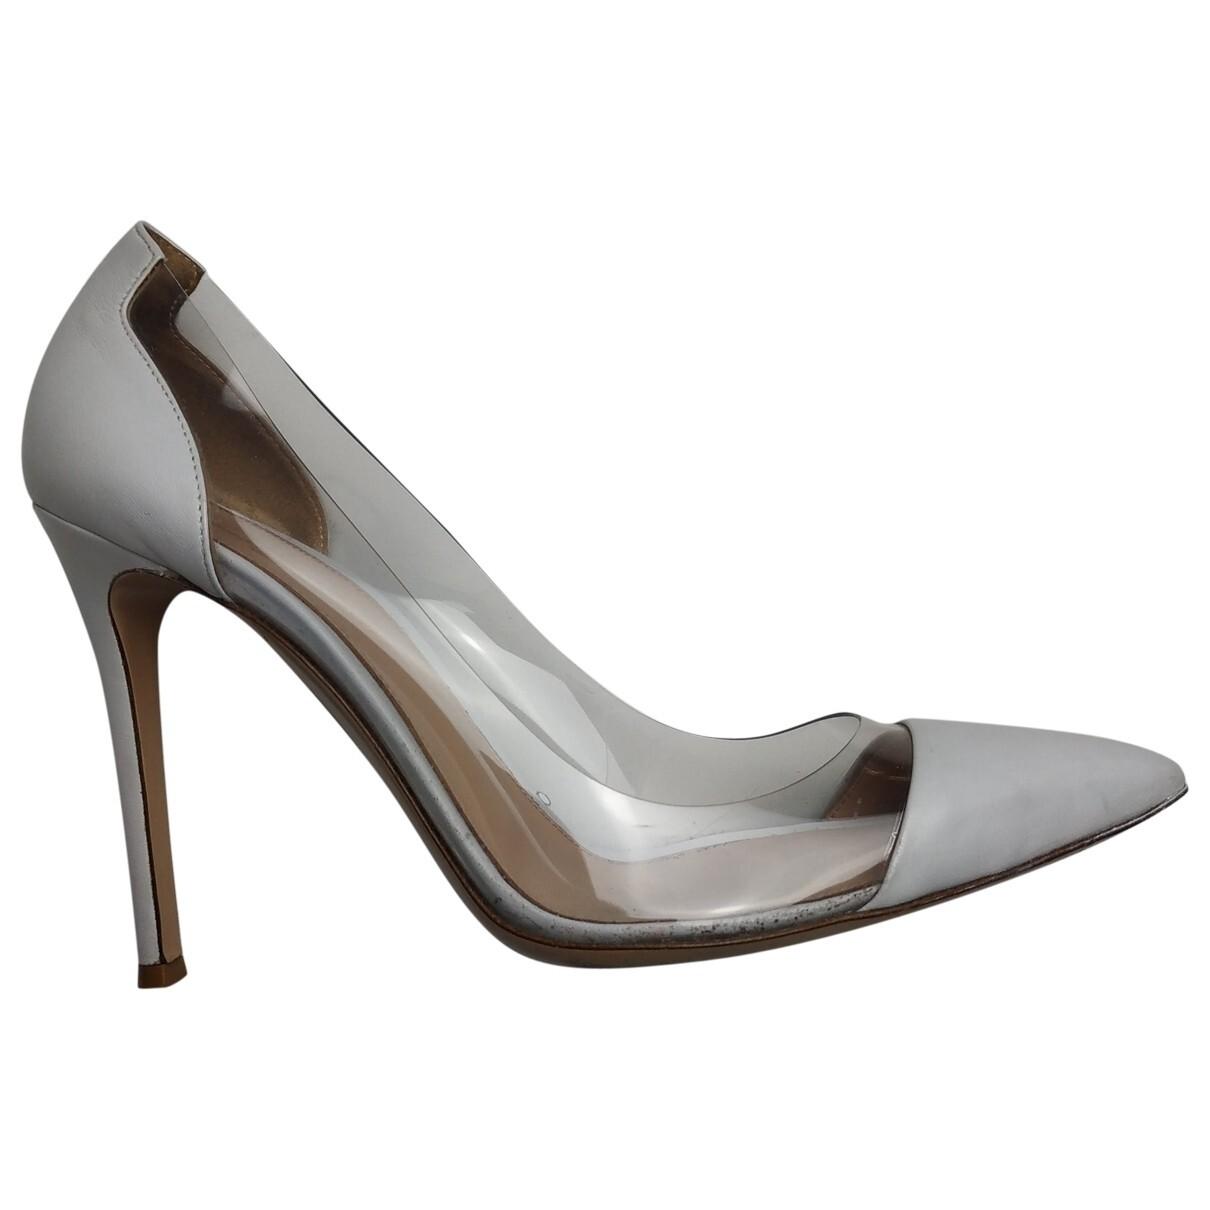 Gianvito Rossi Plexi leather heels